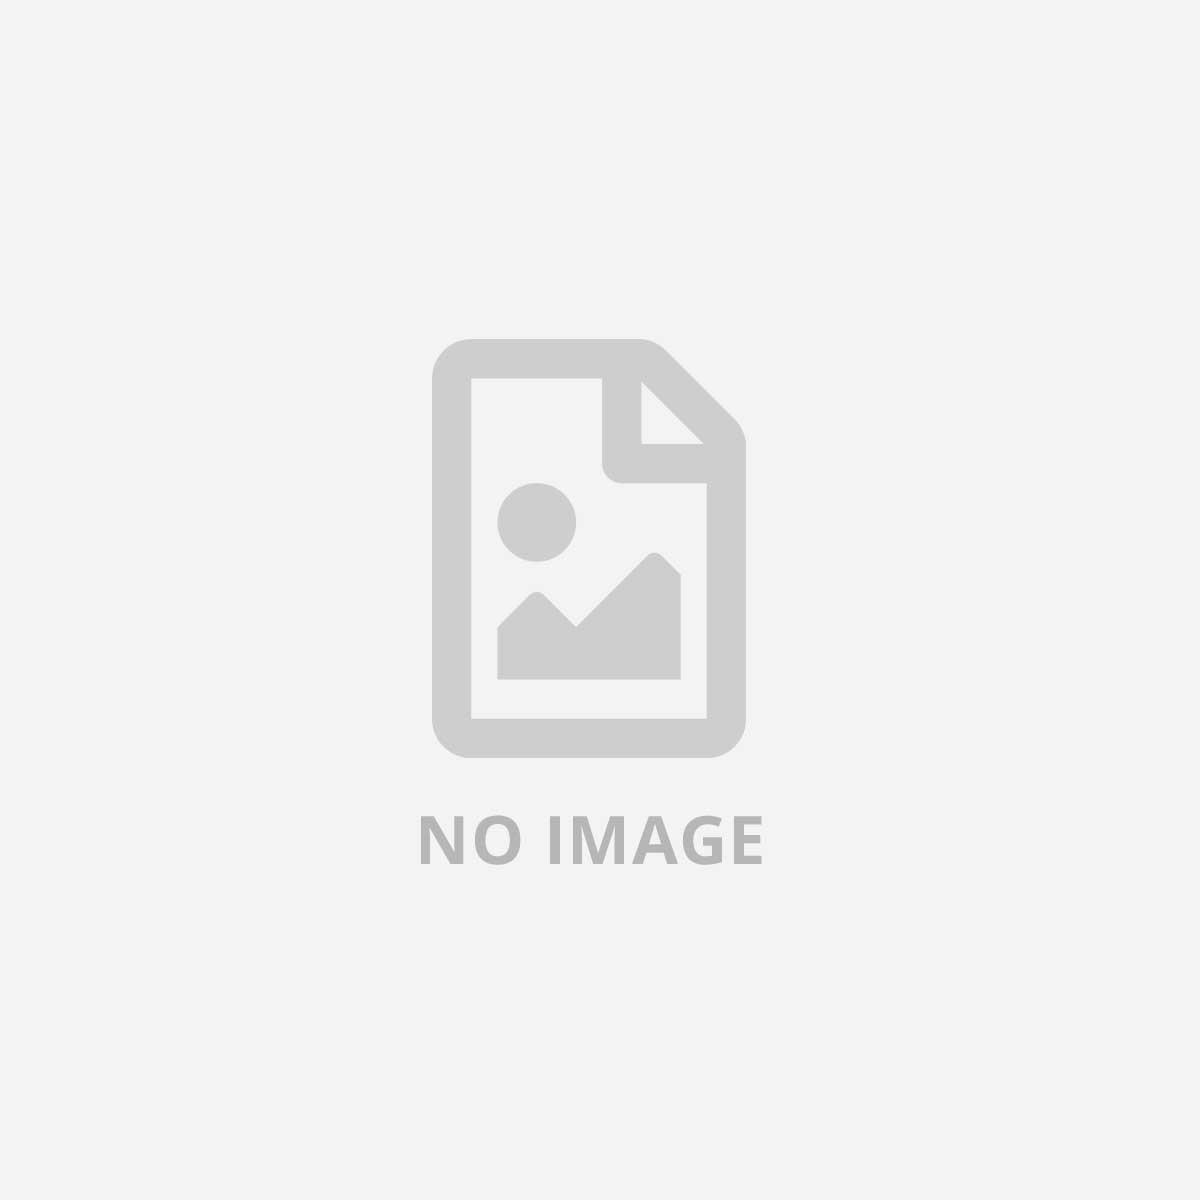 TICO CF20ETICH. A5 ROSSE RETT. 118X70